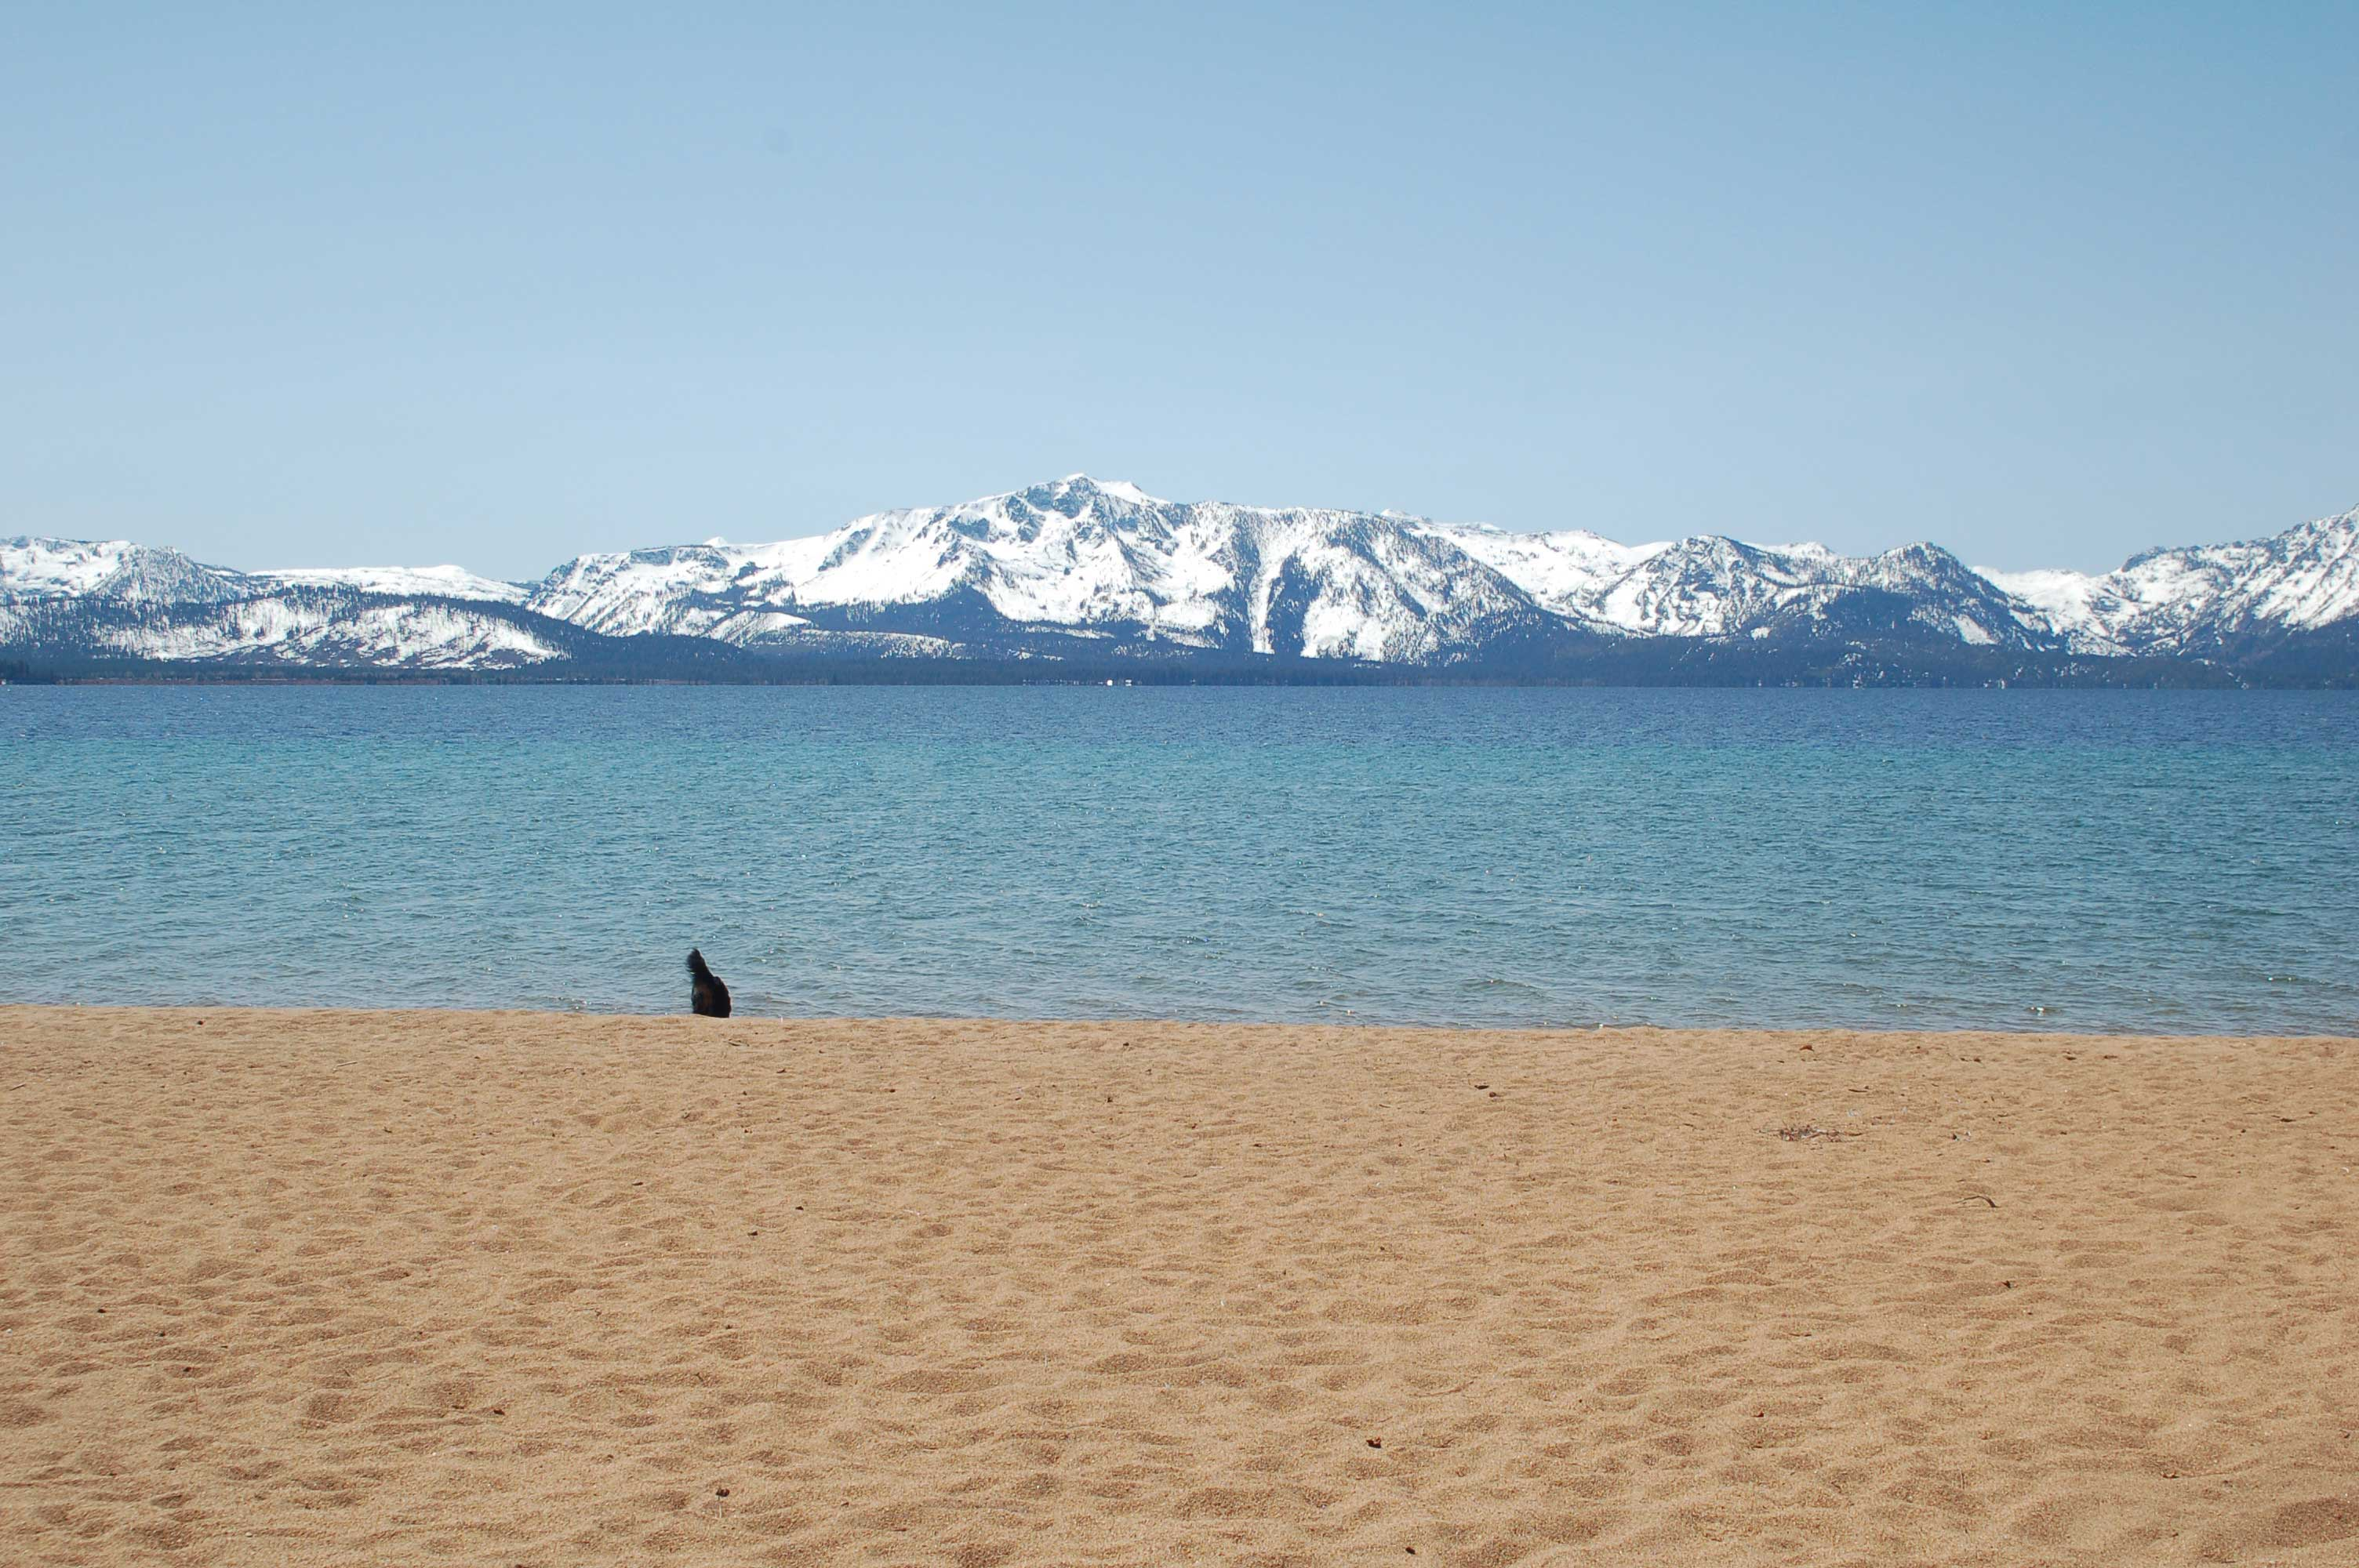 Nevada Beach/ Crédito foto: https://laketahoesplashyweddings.wordpress.com/2012/04/07/nevada-beach-is-a-favorite-site-for-lake-tahoe-beach-weddings/